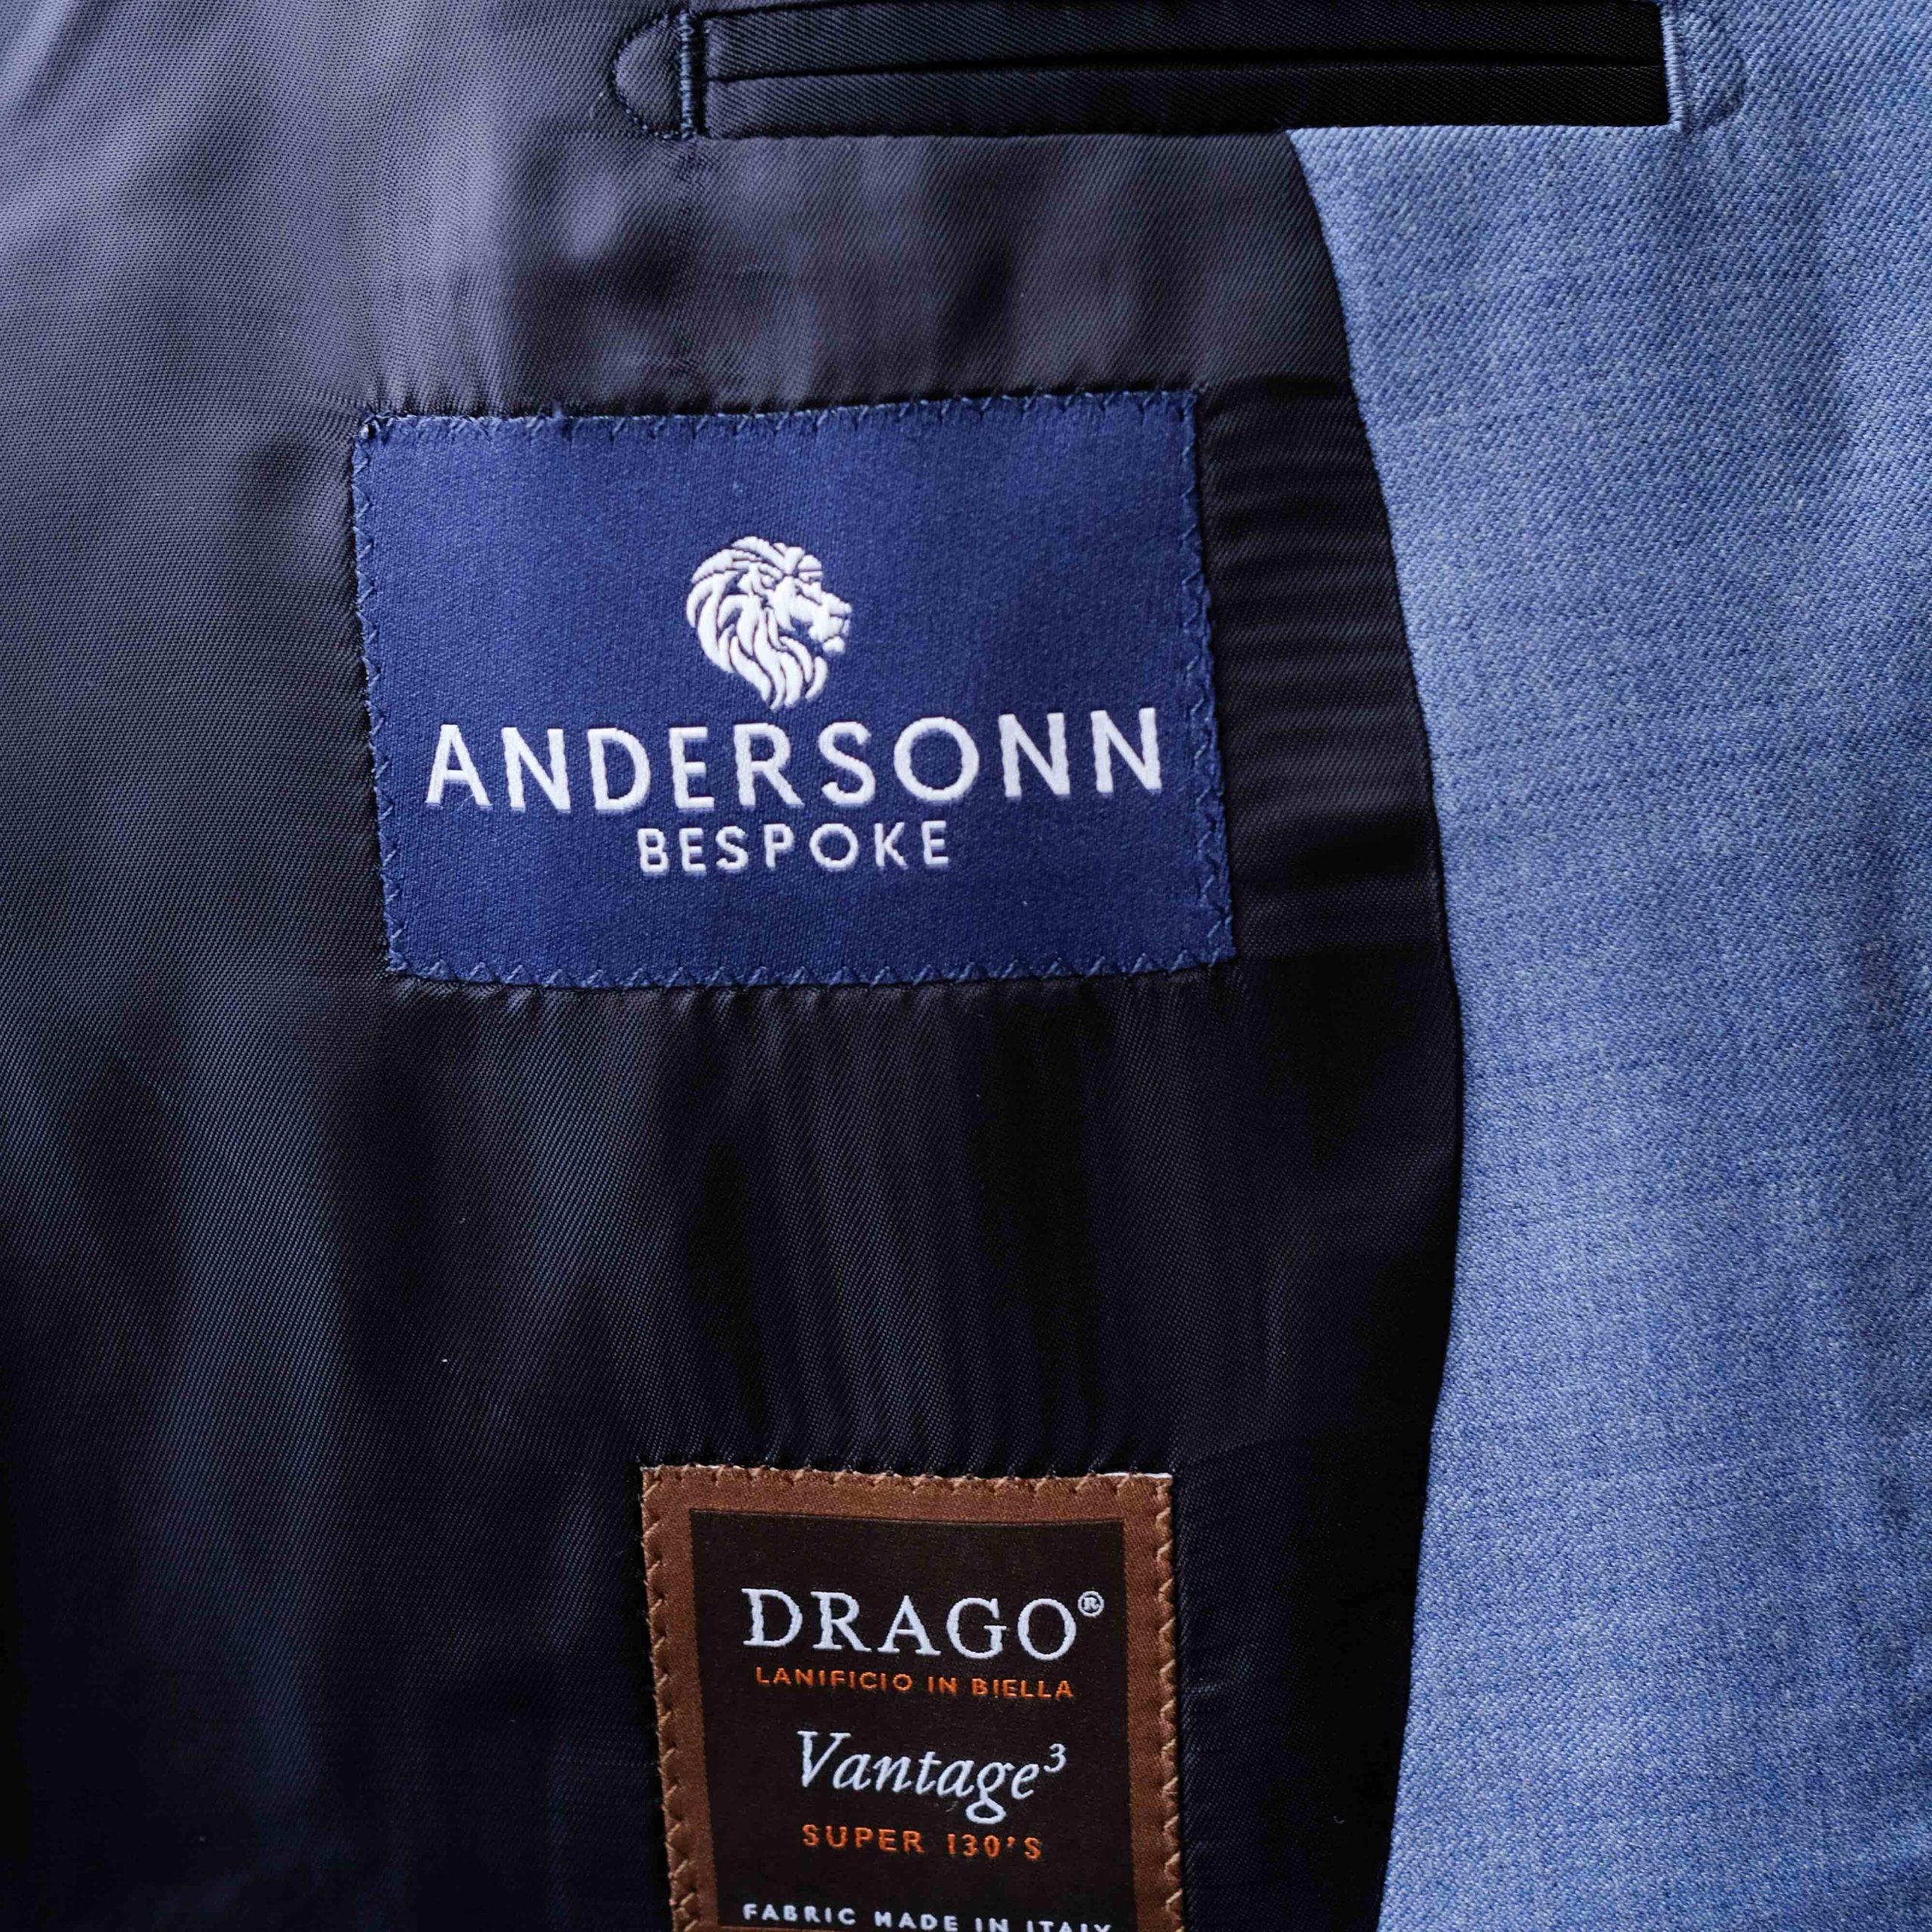 Andersonn Bespoke Label - Drago Biella